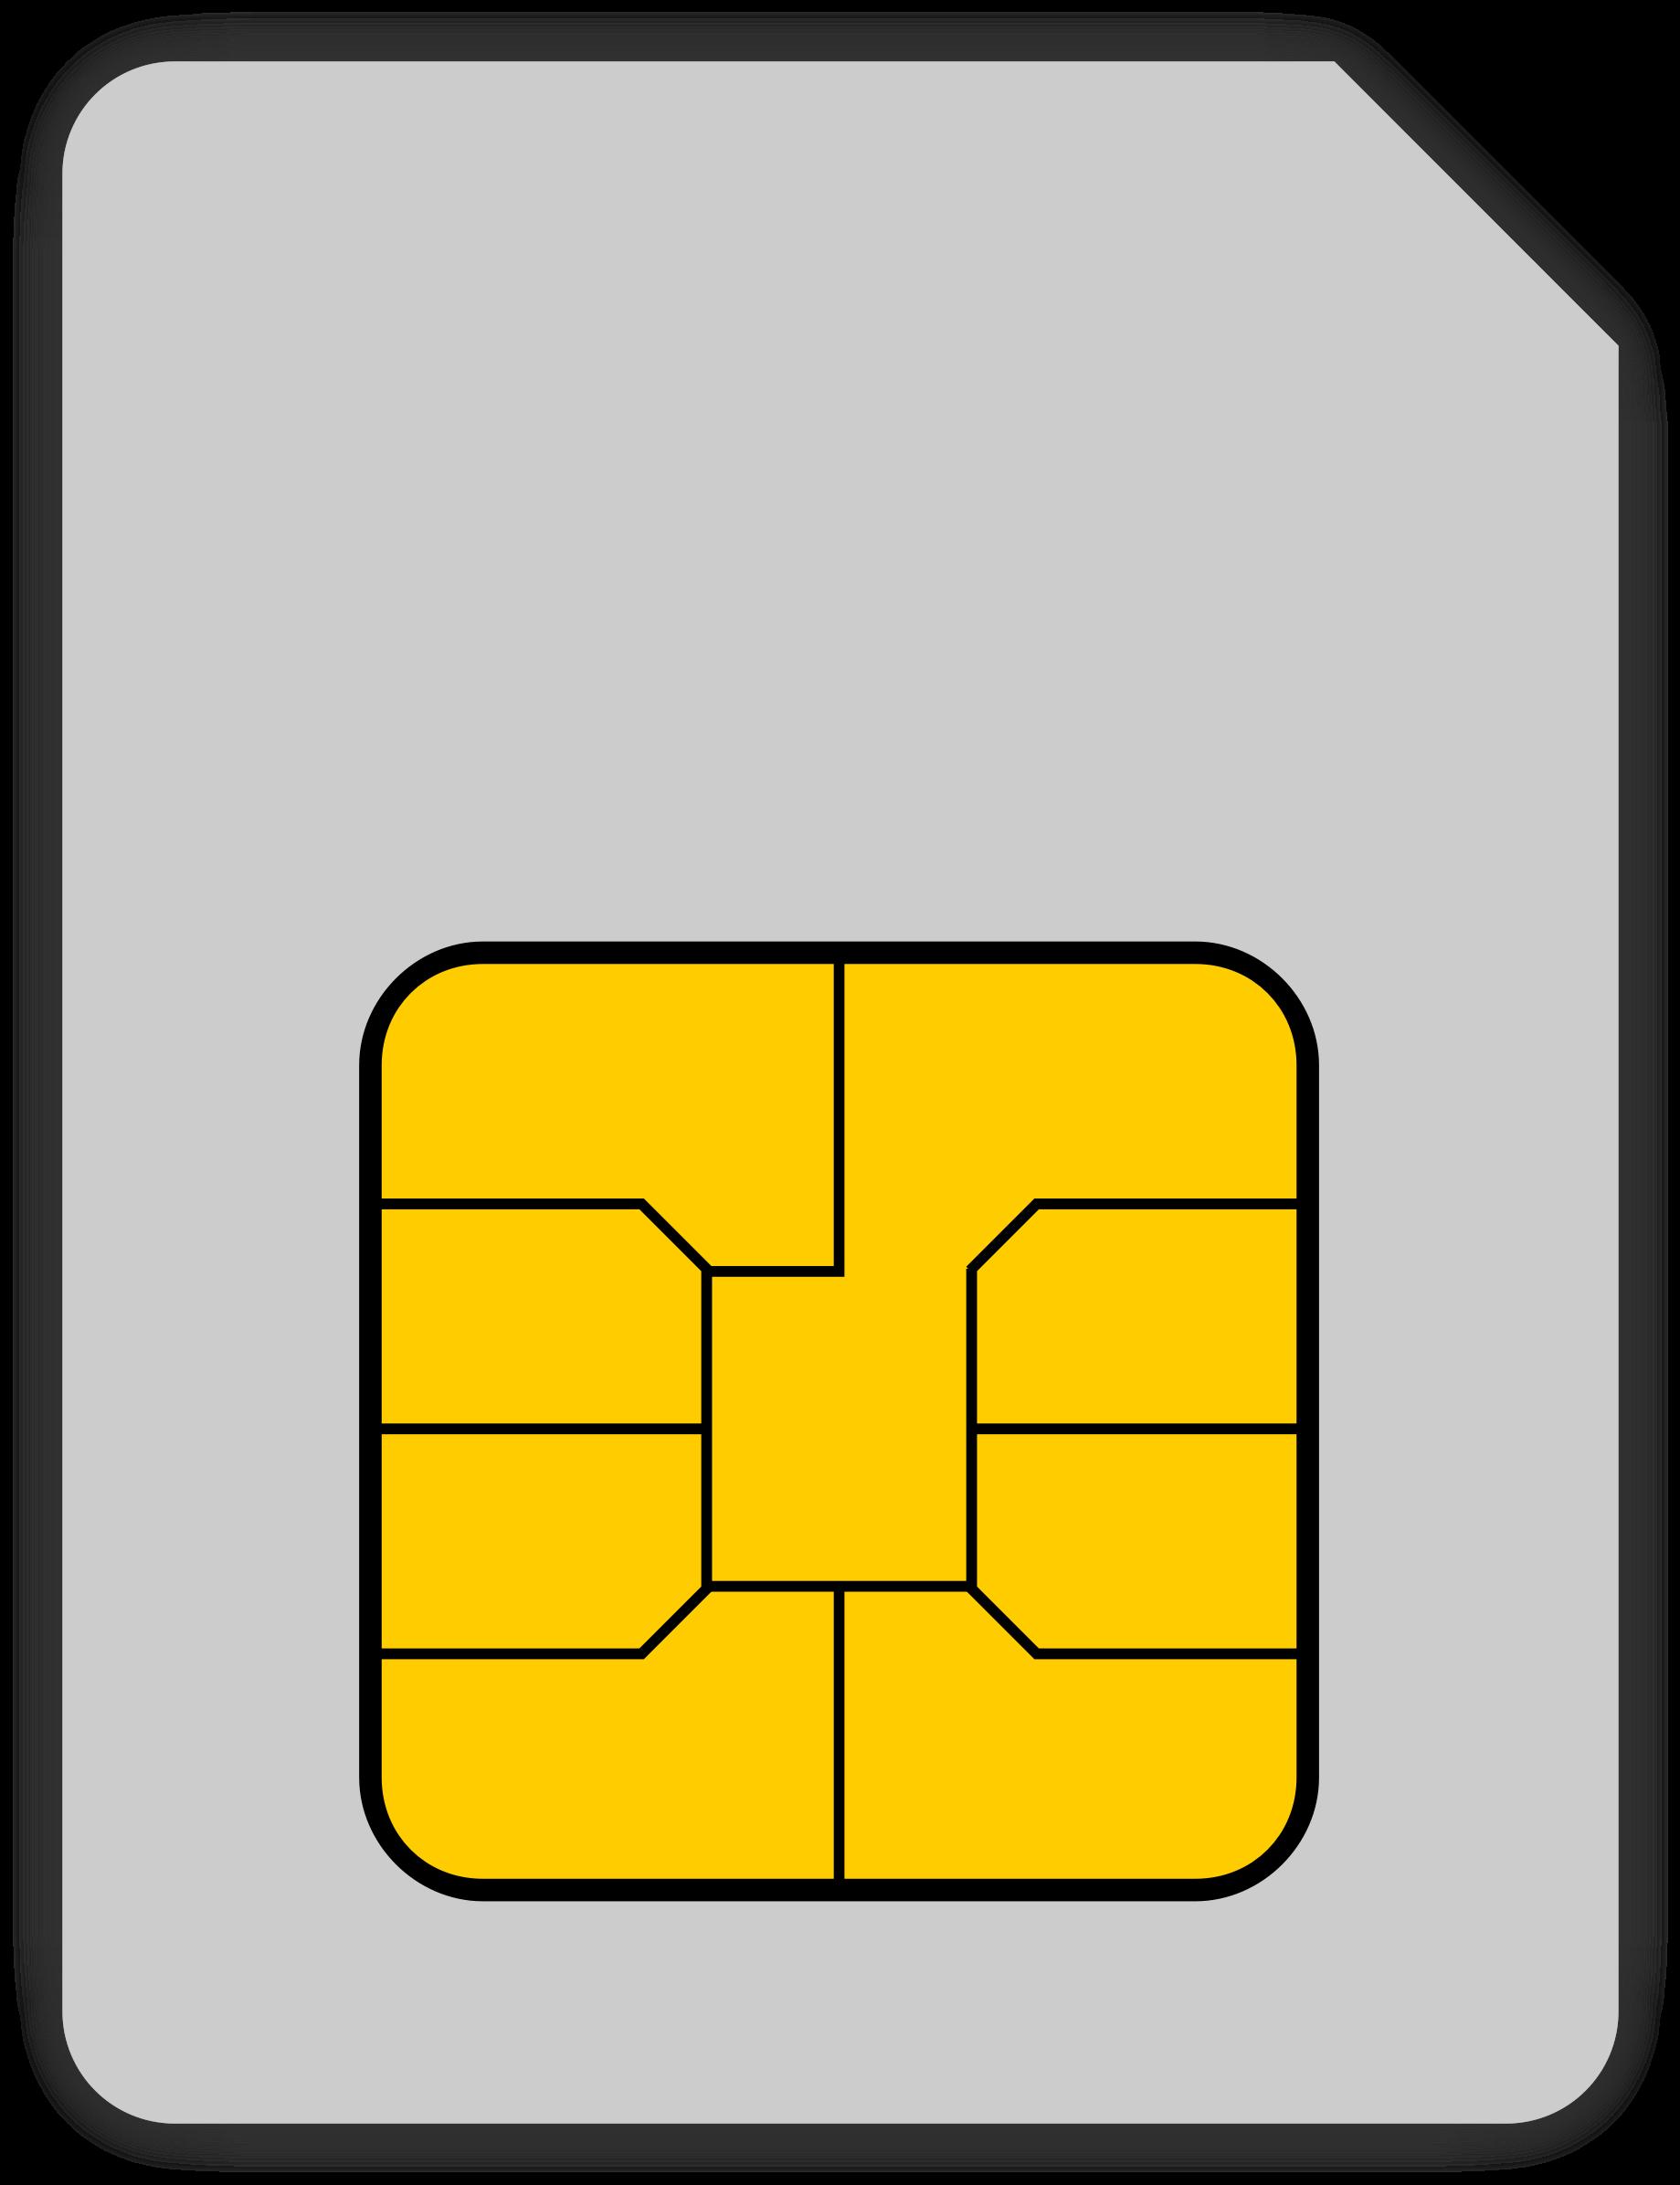 Сим карта PNG